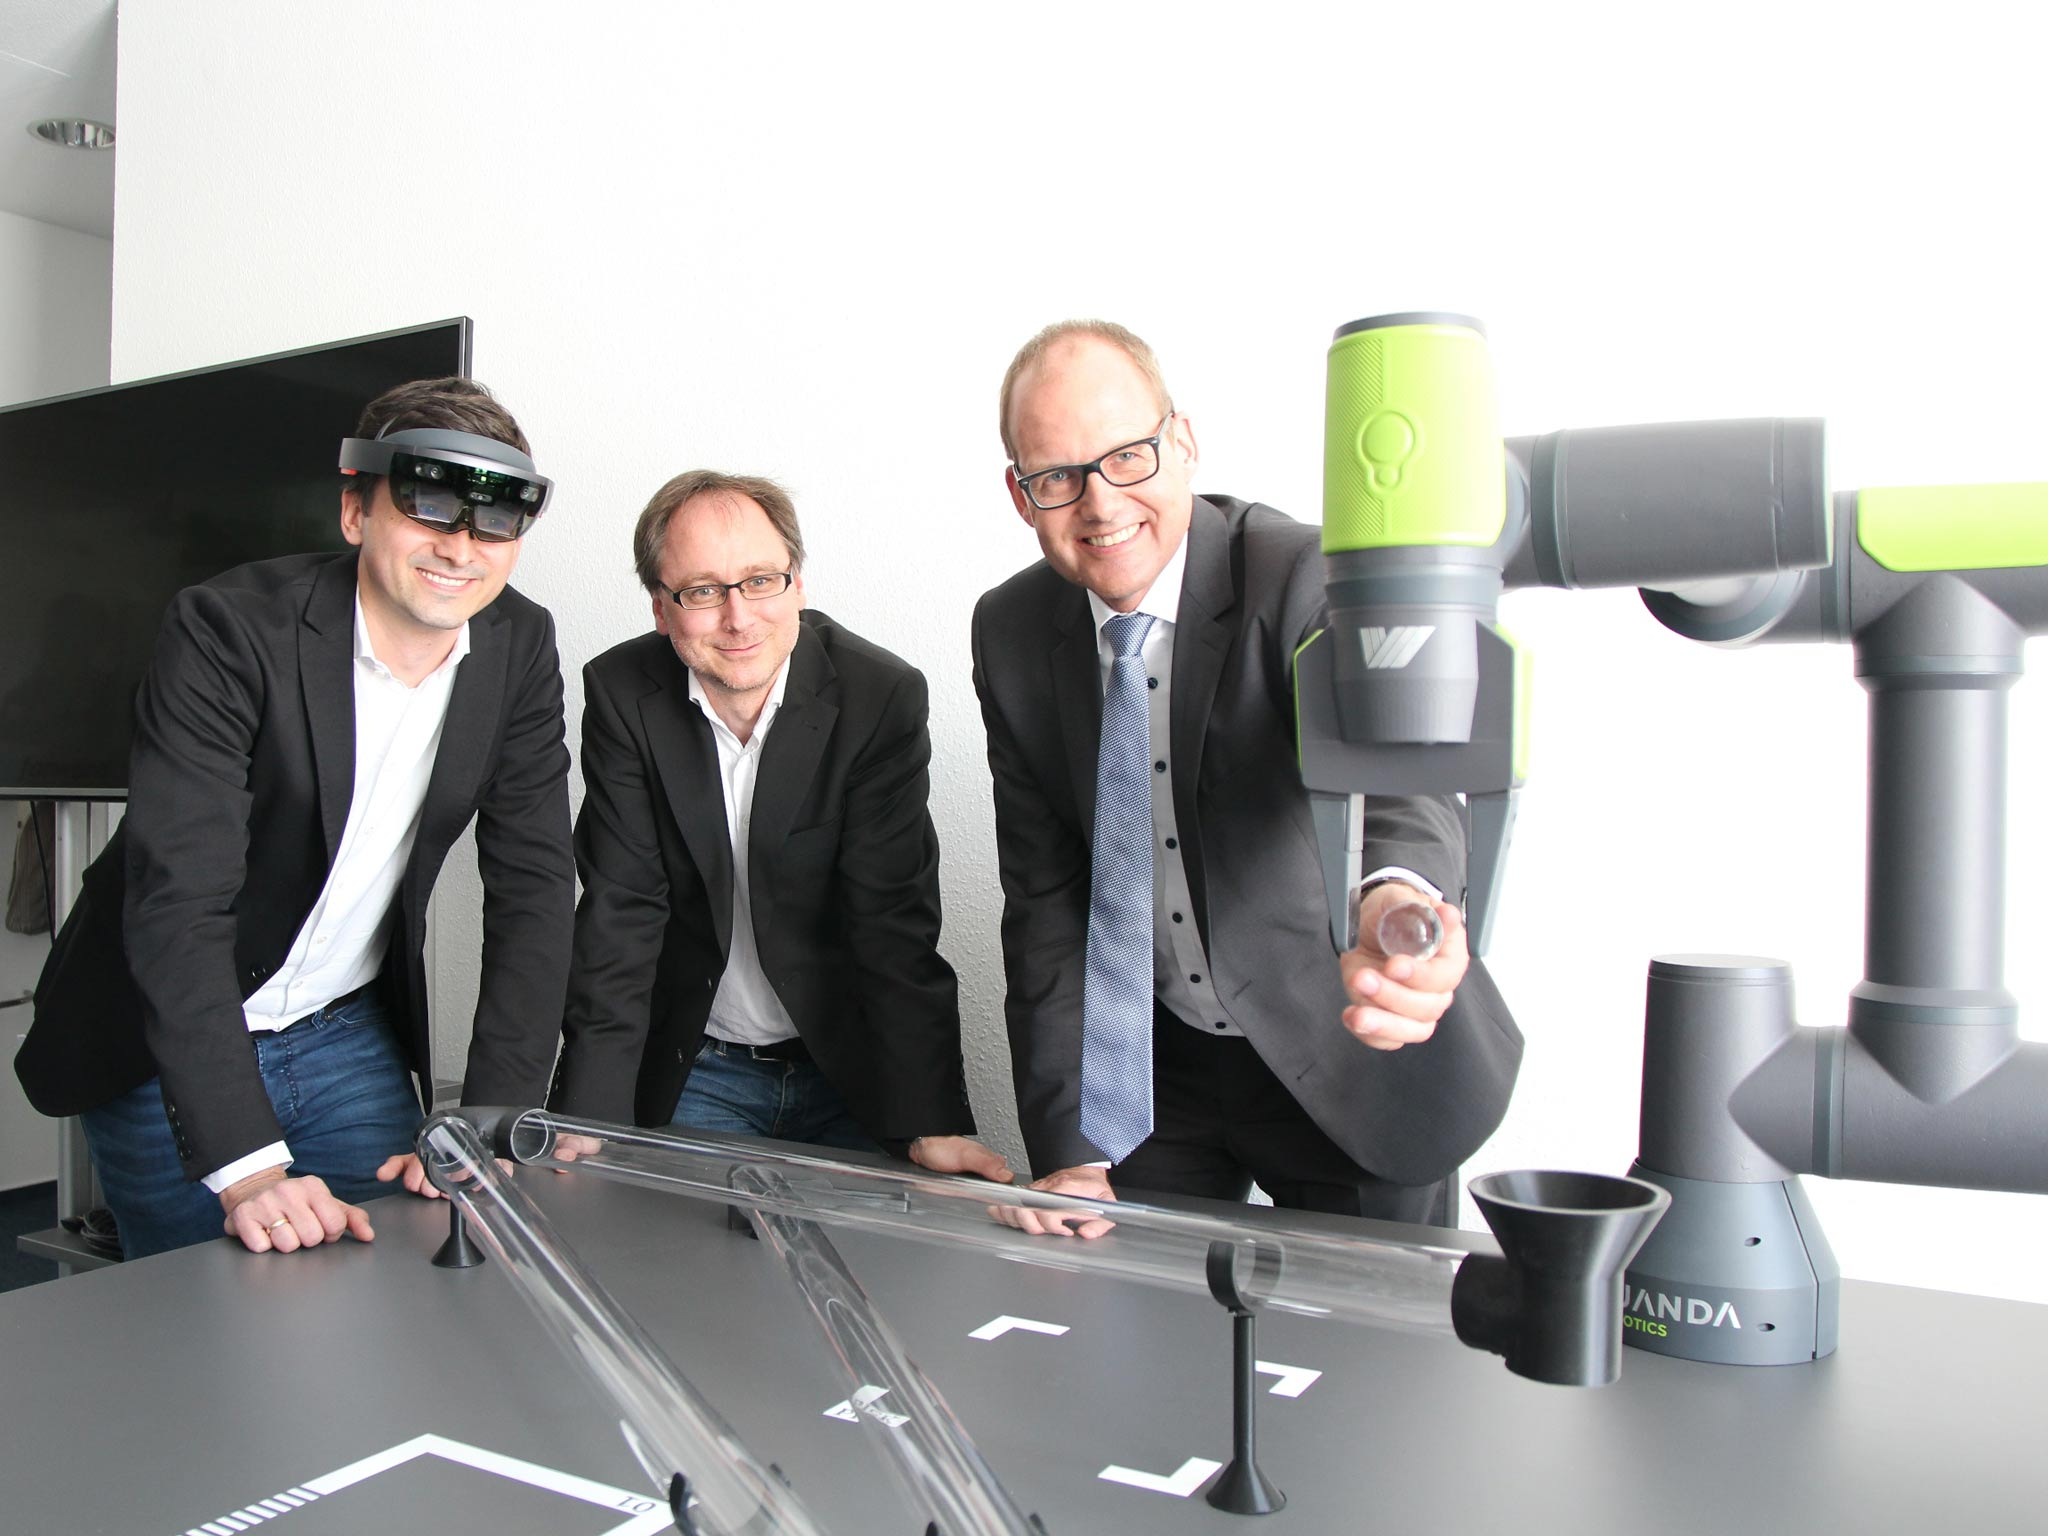 Drei Männer testen einen Roboter.